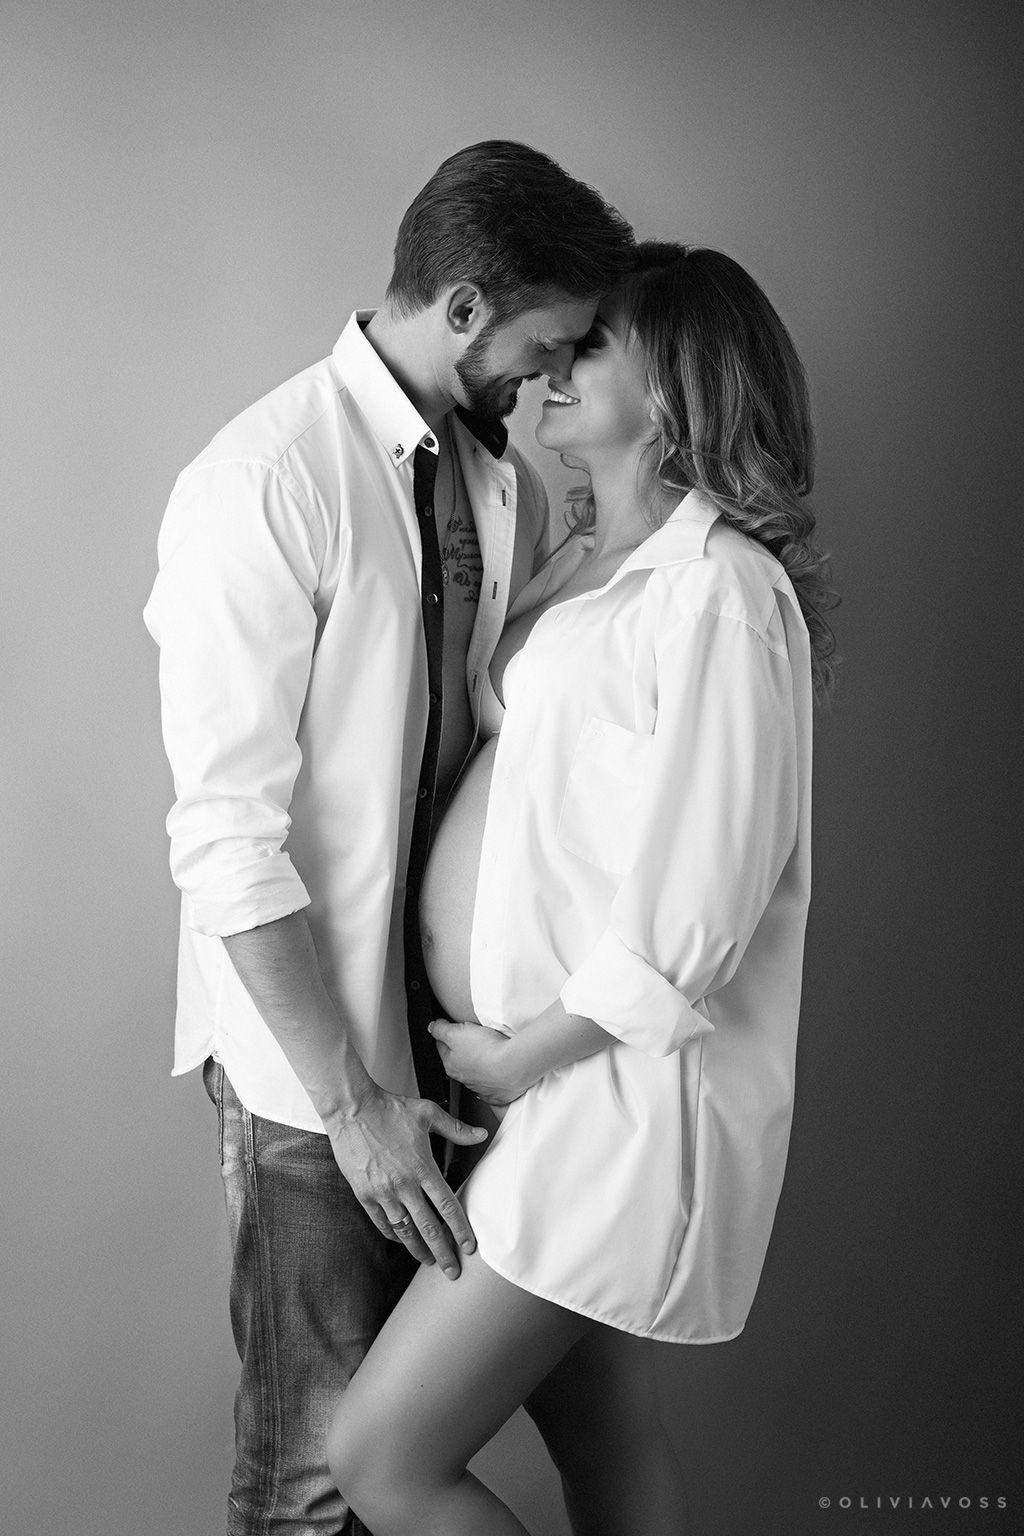 Pin auf Fotoshooting pregnant